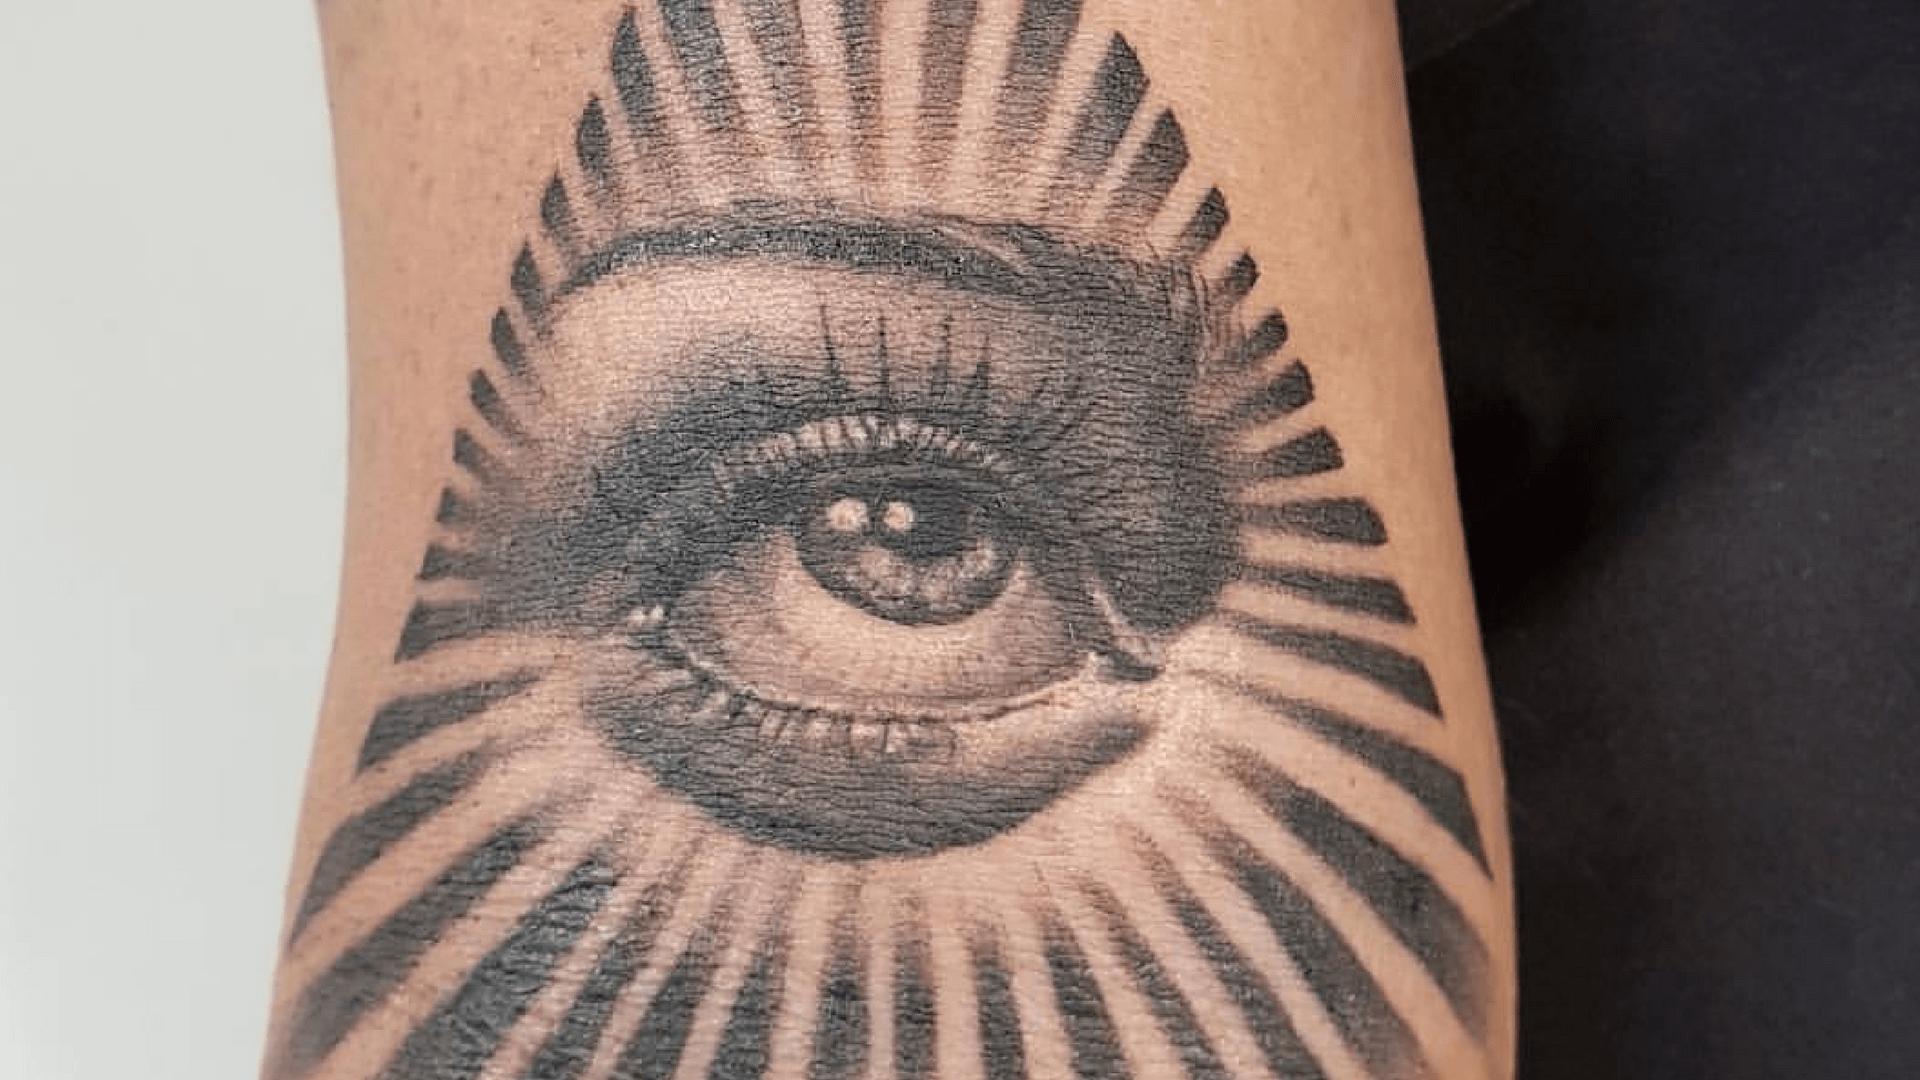 10 Top Tattoo Parlours In Johannesburg